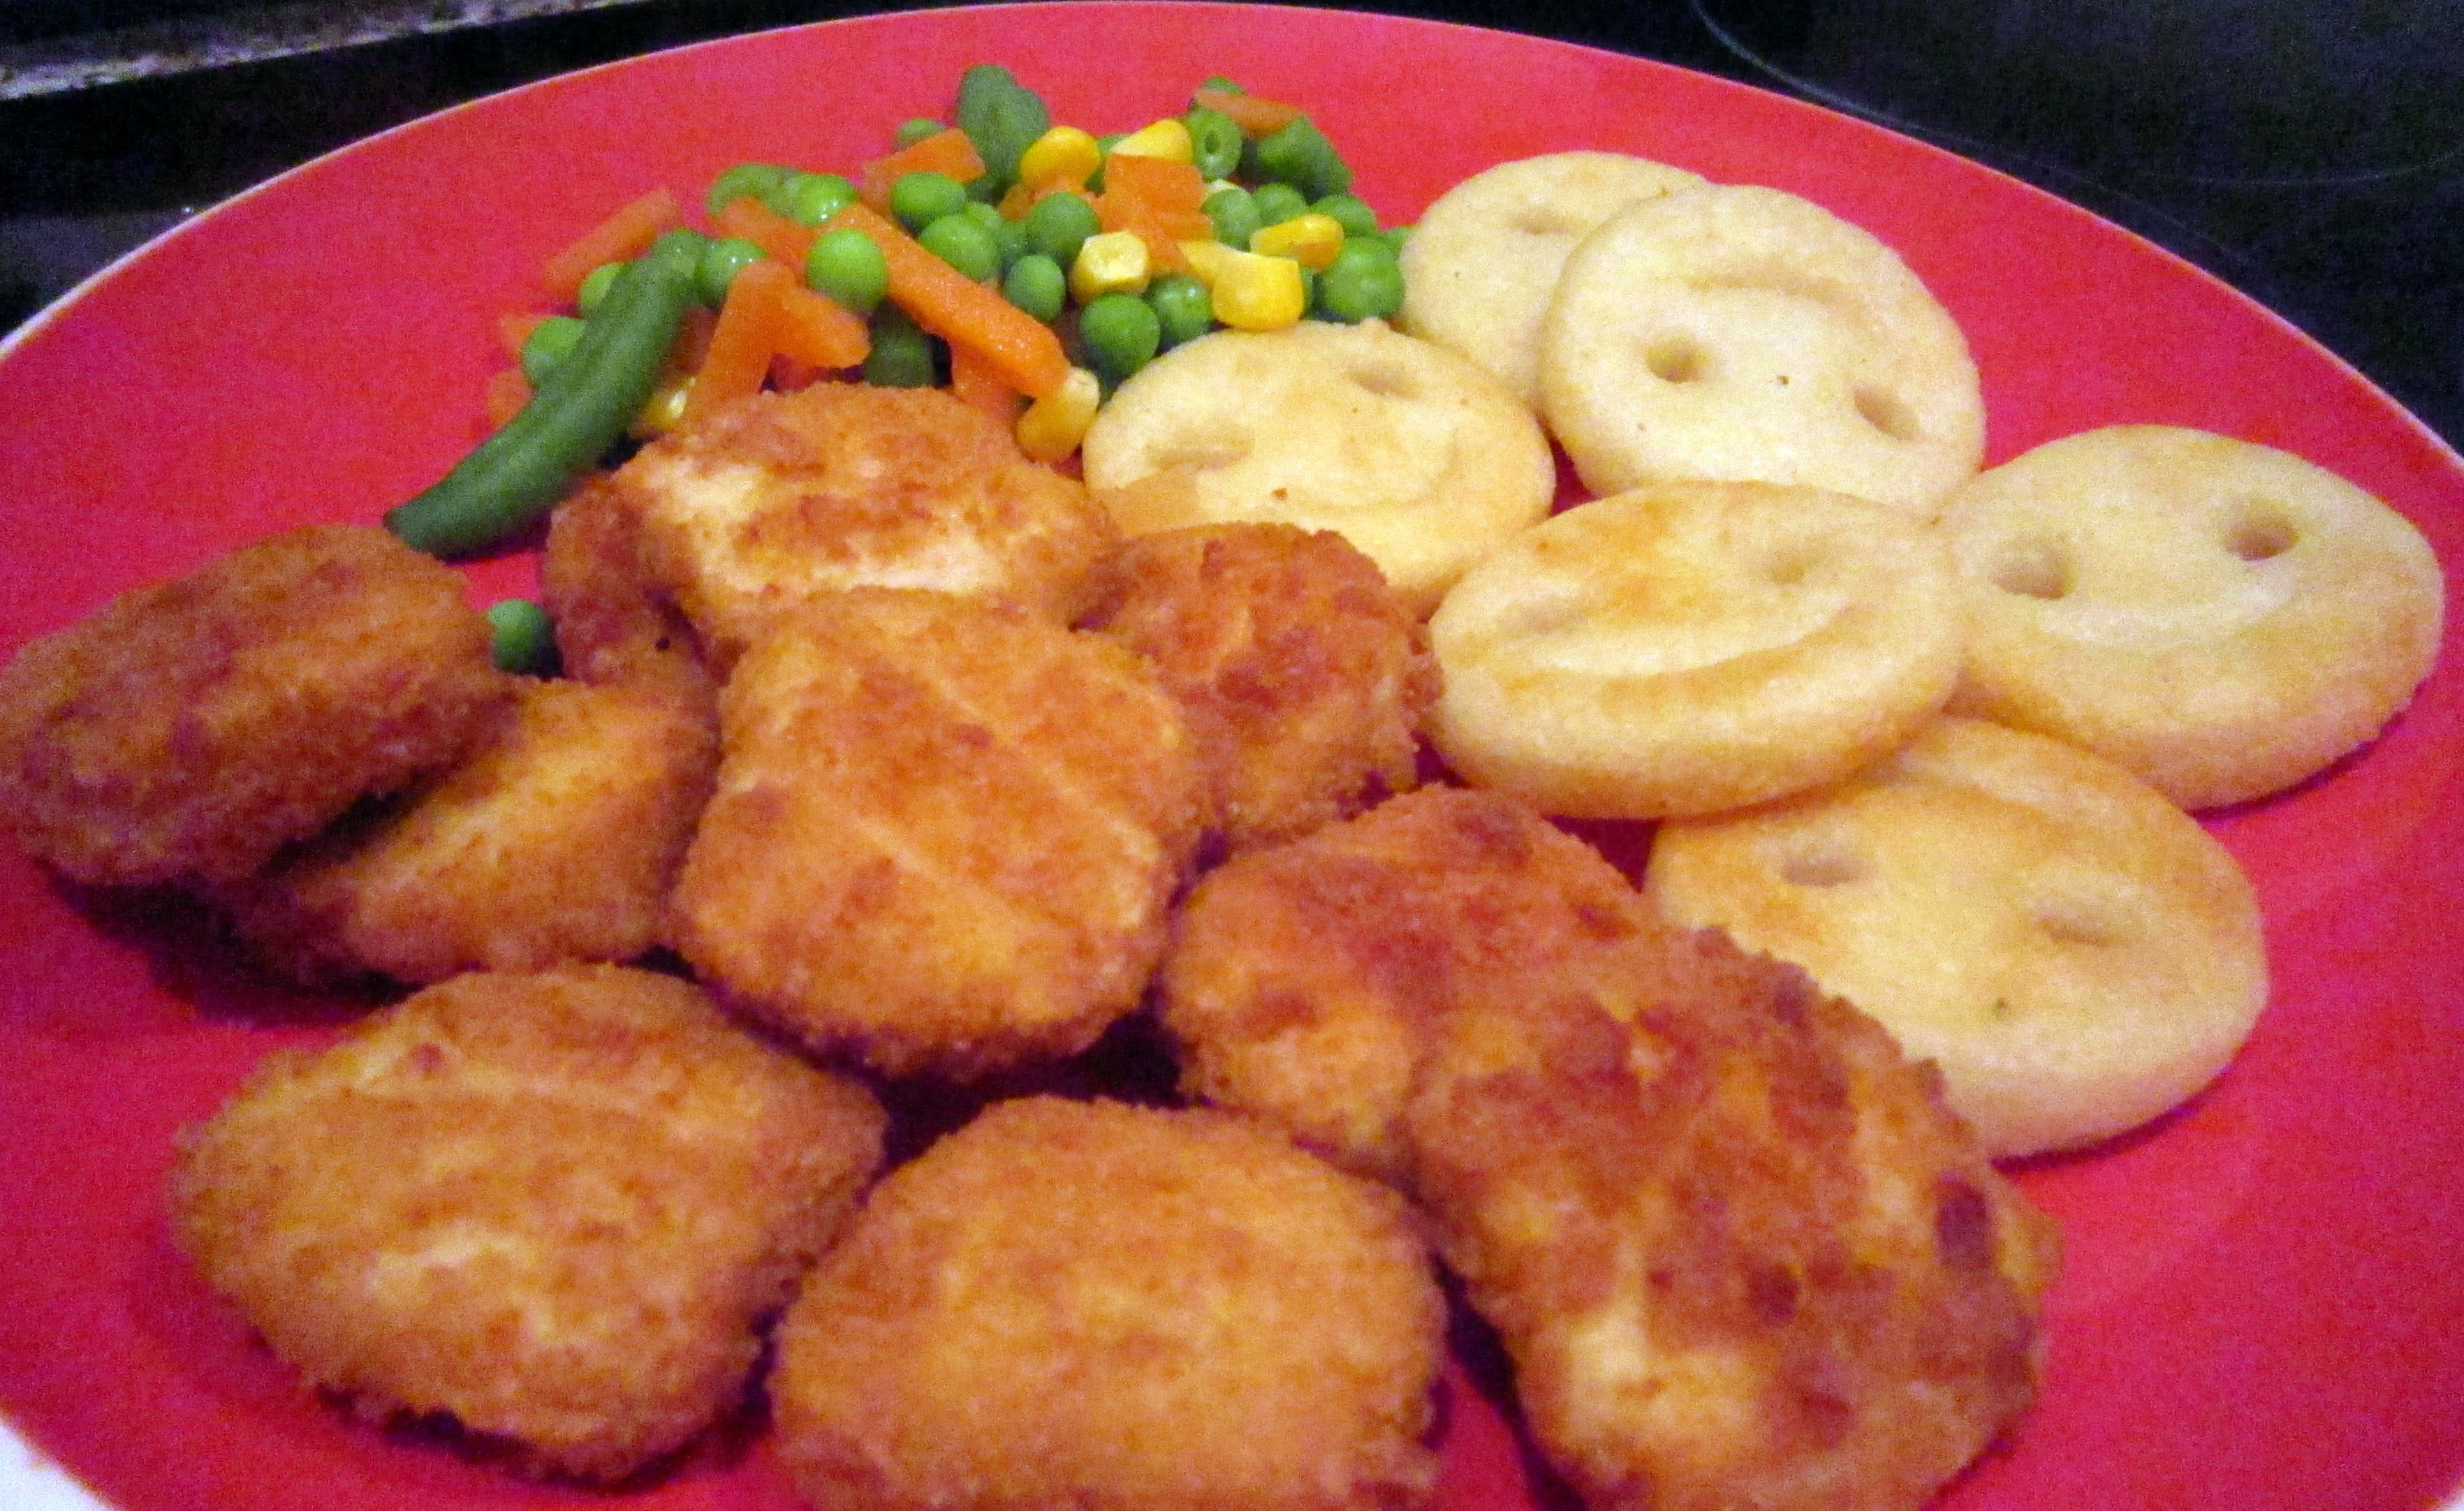 chicken nuggets plate